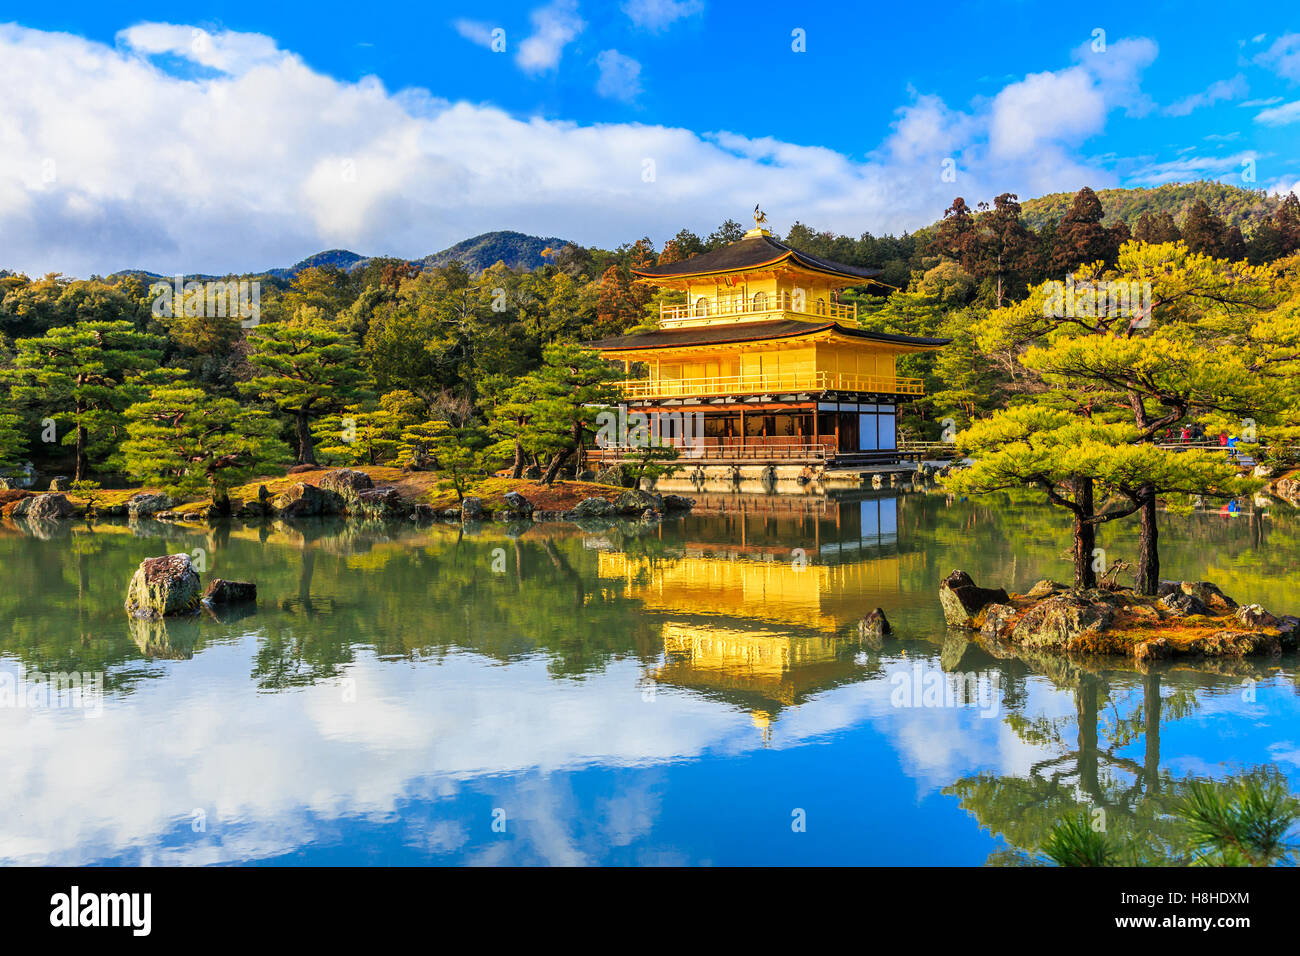 Kyoto, Japan. Goldener Pavillon am Kinkakuji-Tempel. Stockbild